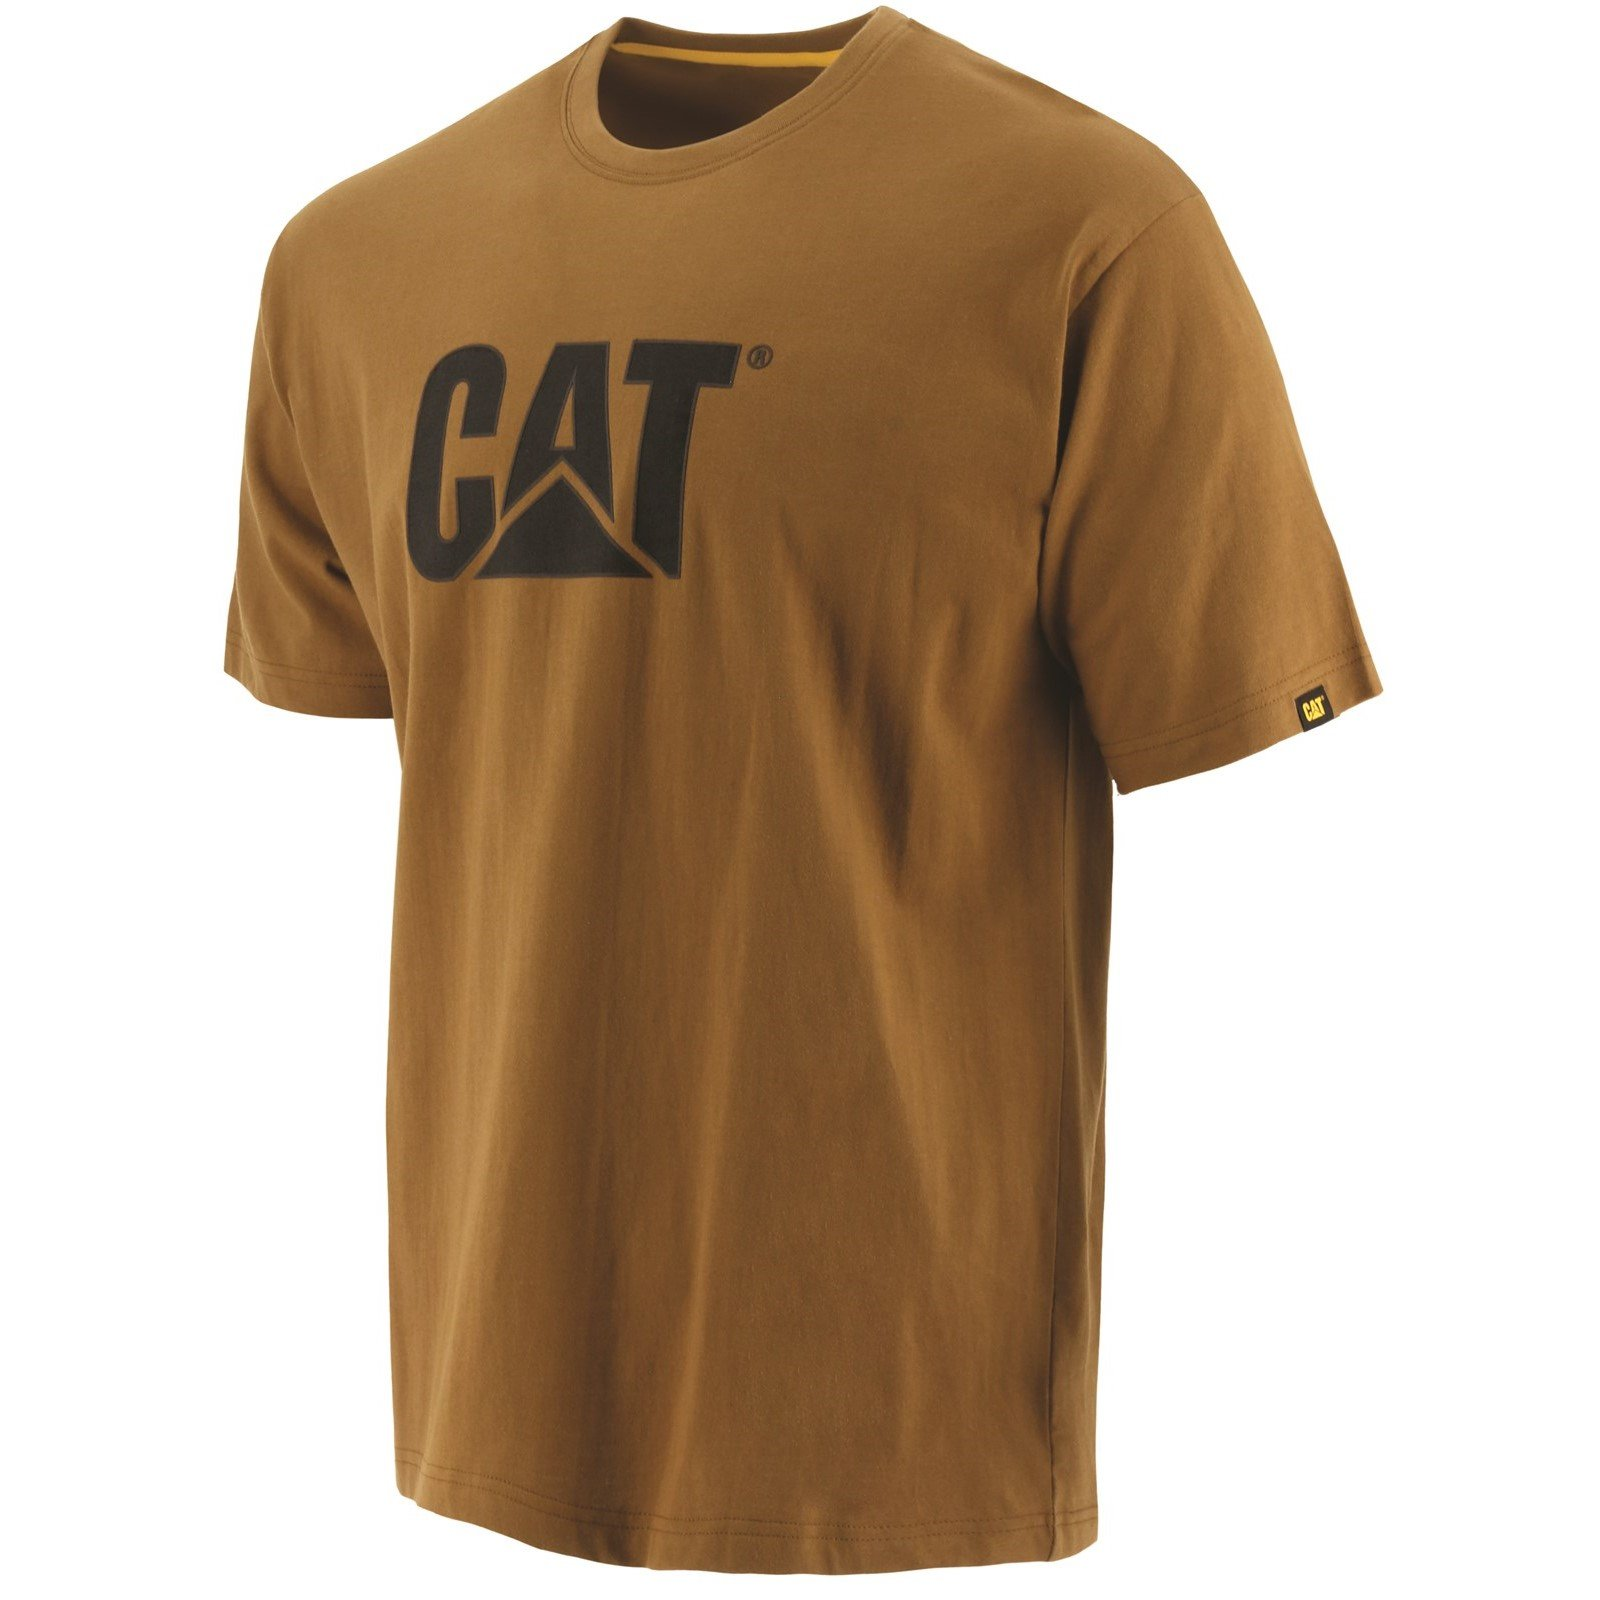 Caterpillar Men's Trademark Logo T-Shirt Various Colours 25301-42086 - Bronze Med